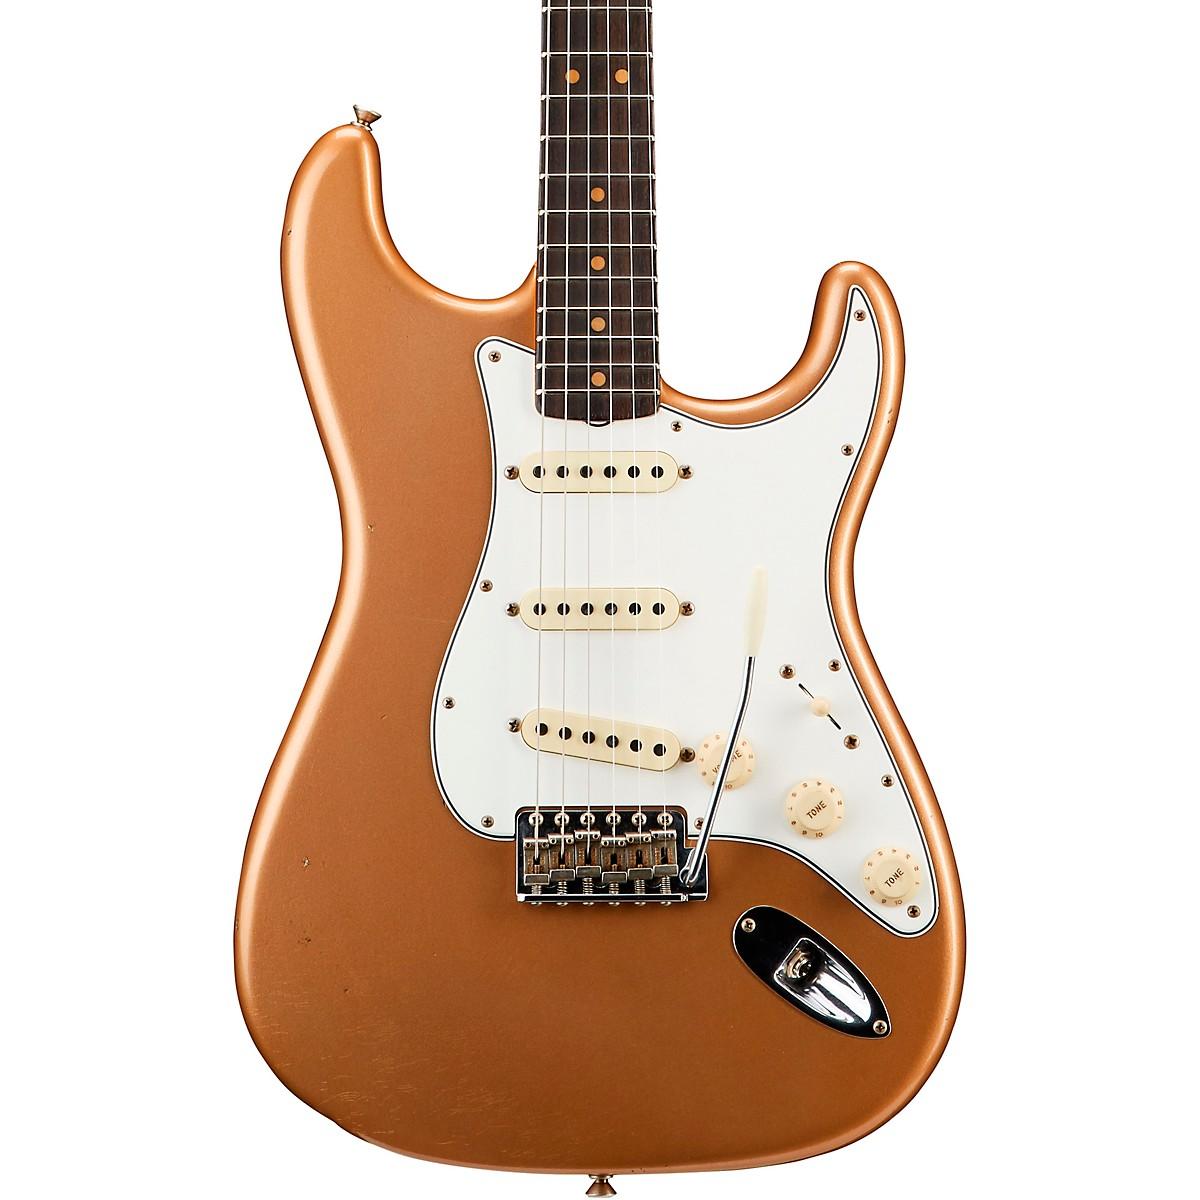 Fender Custom Shop 1964 Stratocaster Electric Guitar